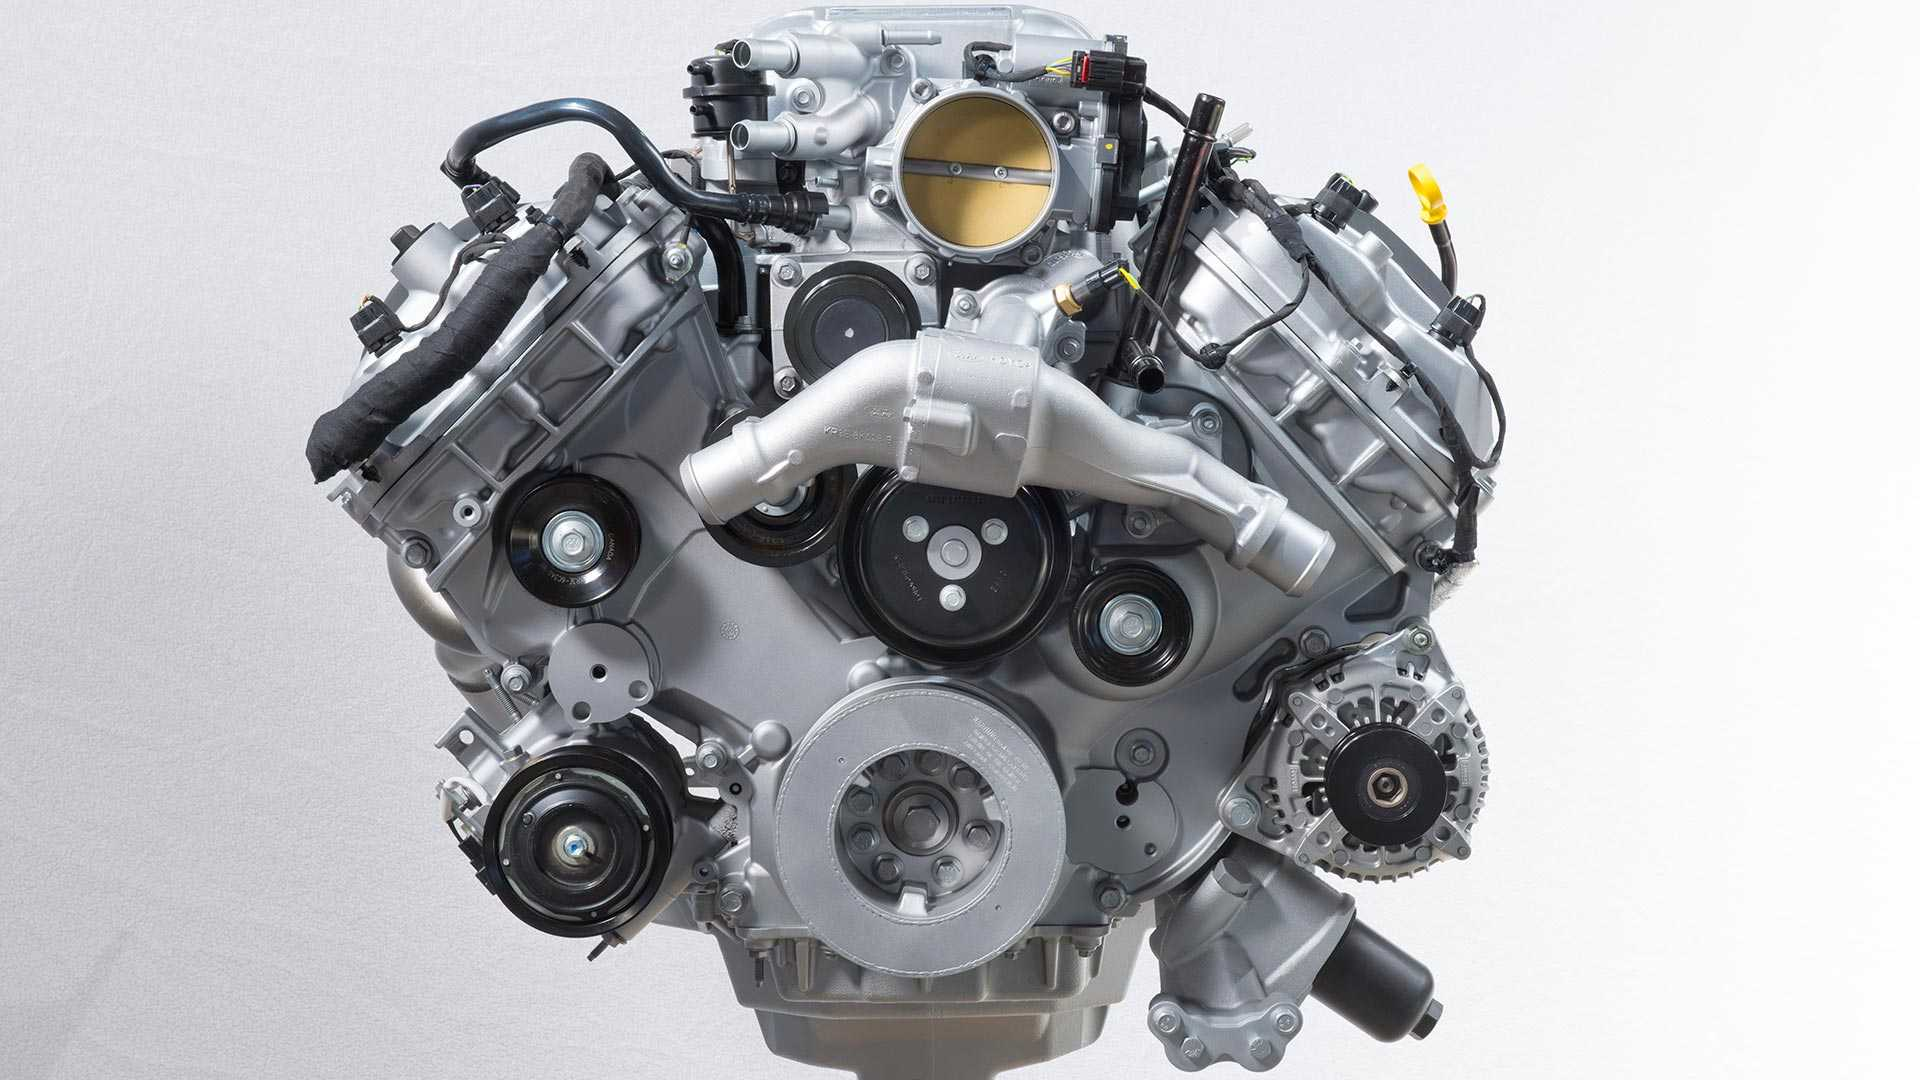 https://cdn.motor1.com/images/mgl/KkzxR/s6/2020-ford-mustang-shelby-gt500-engine.jpg